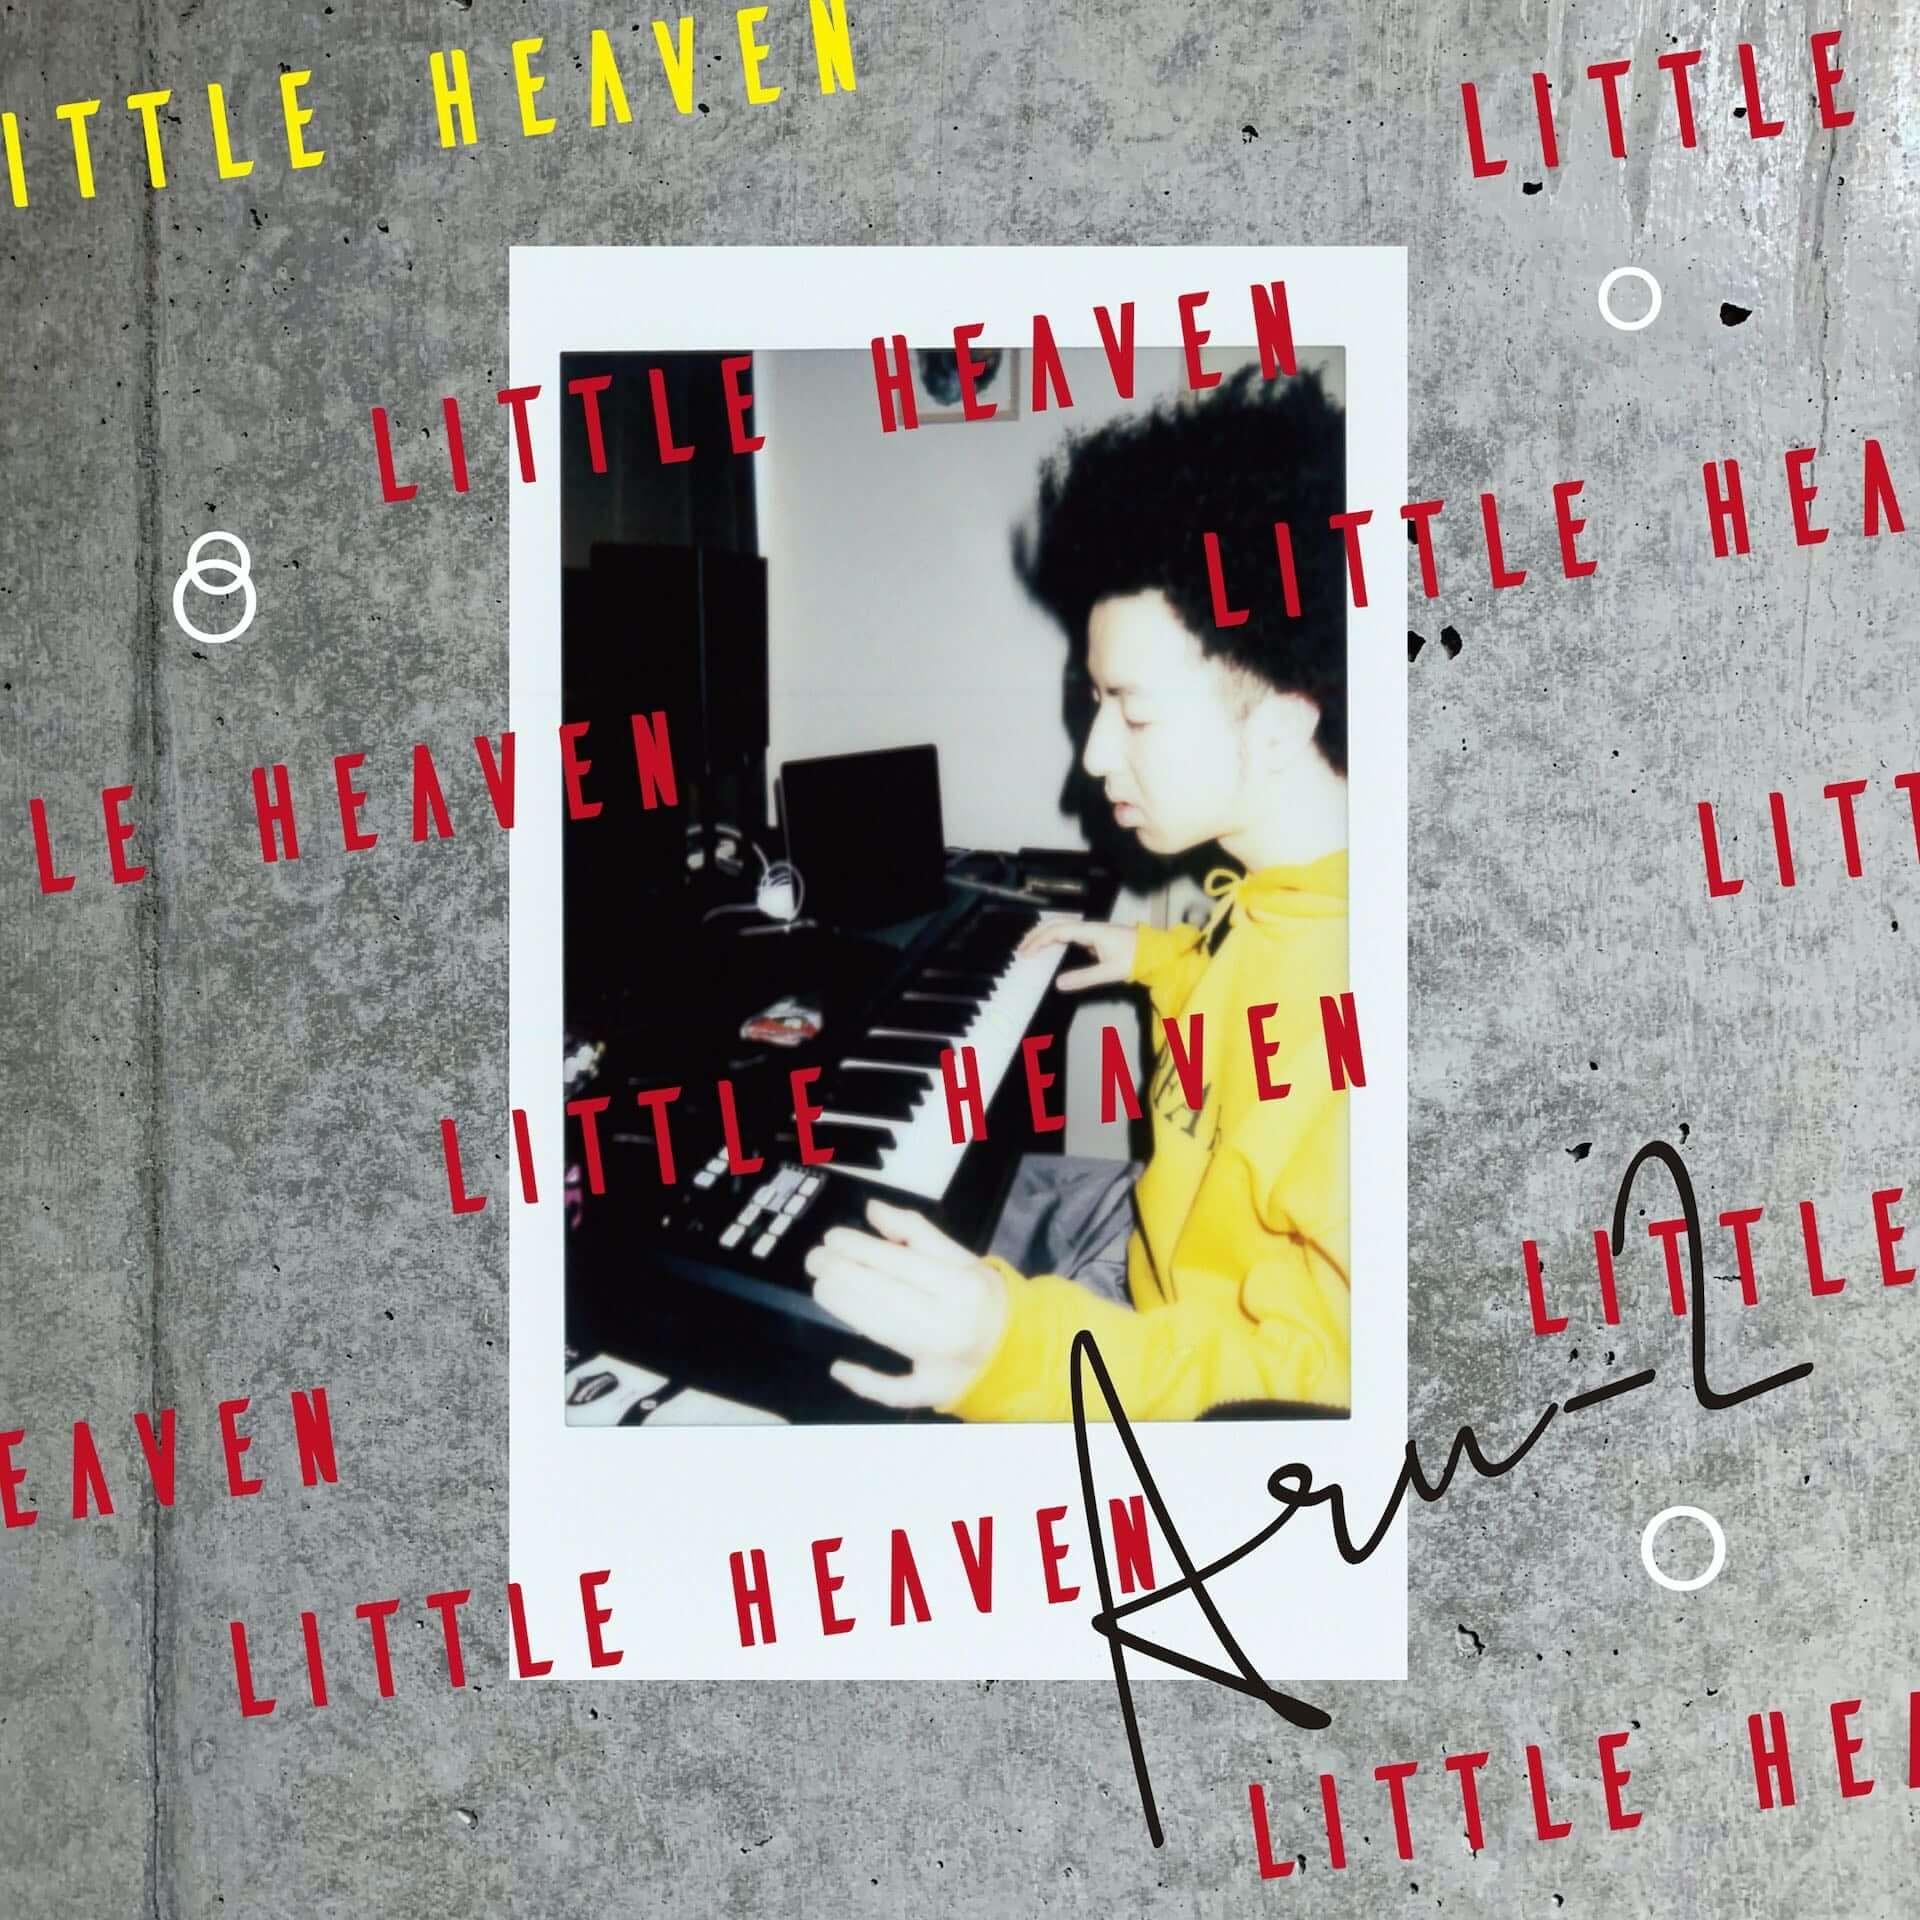 Aru-2がフルアルバム『Little Heaven』を配信・CDでリリース!KID FRESINO、Issugi、JJJらが参加 music200610_aru2_02-1920x1920